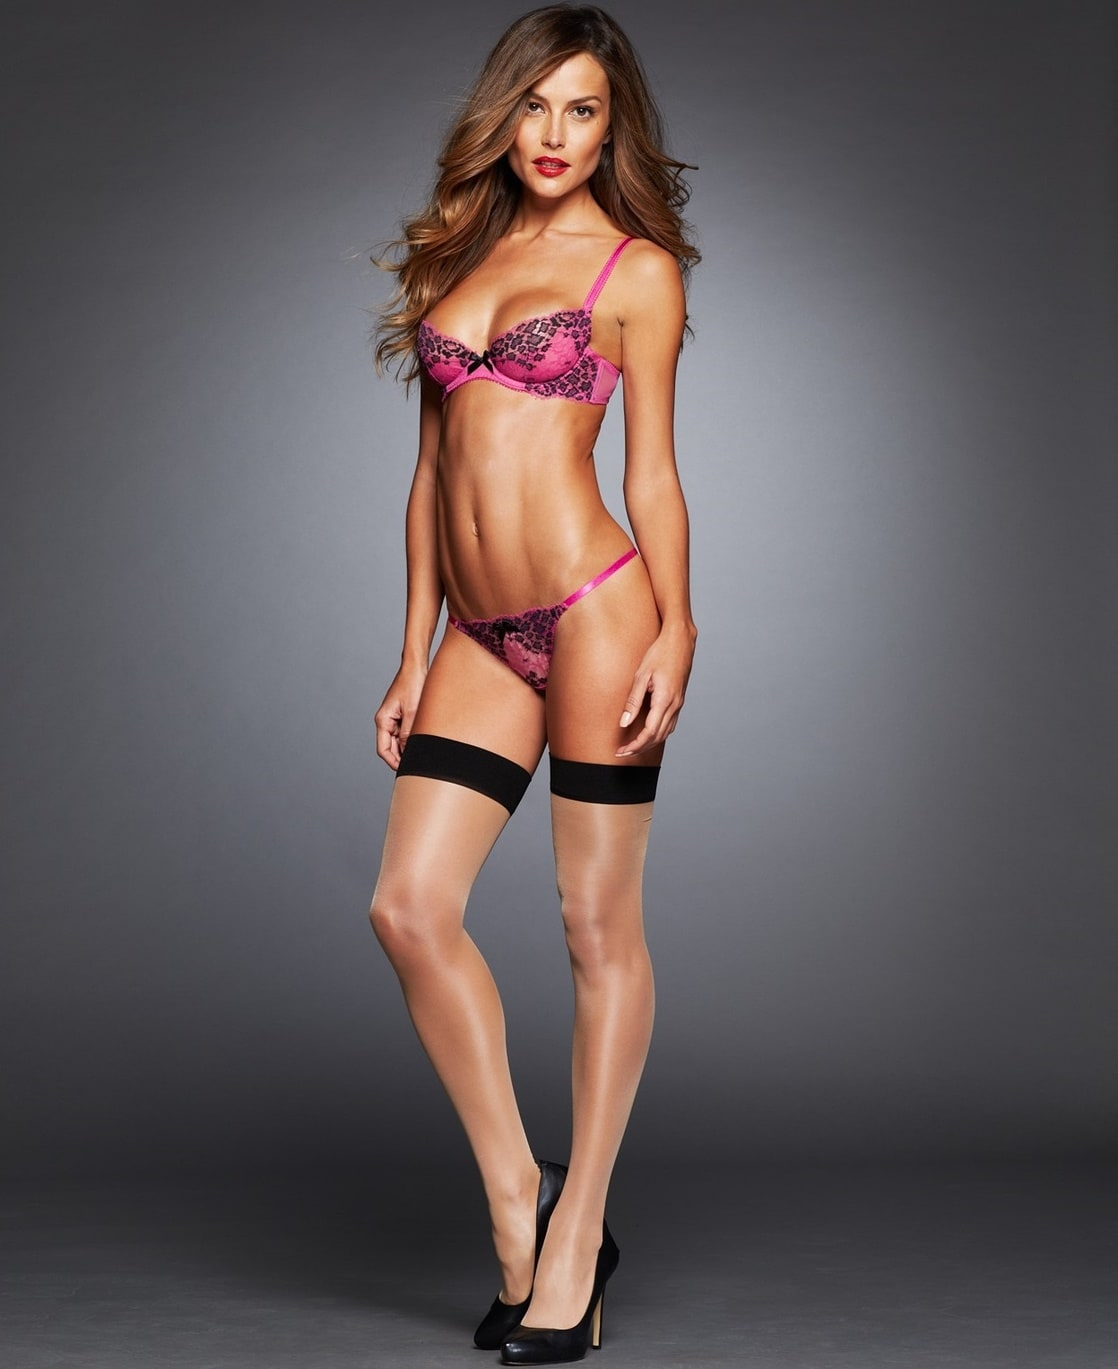 Snapchat Natalia Borges nudes (21 photos), Sexy, Cleavage, Instagram, in bikini 2020